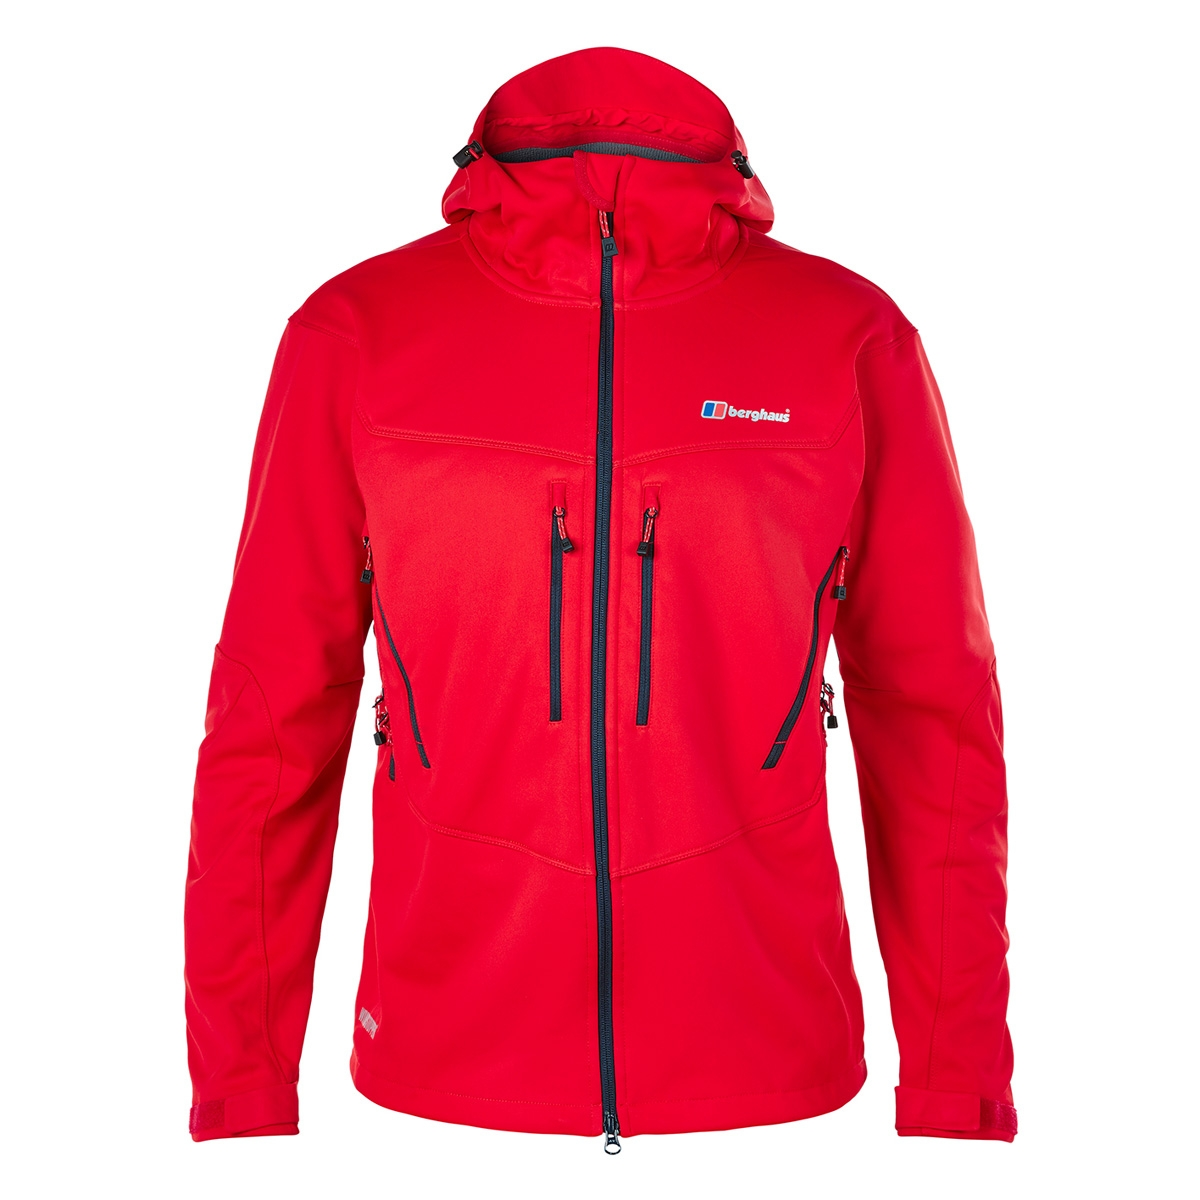 berghaus winter valparola softshell jacket men 39 s red. Black Bedroom Furniture Sets. Home Design Ideas